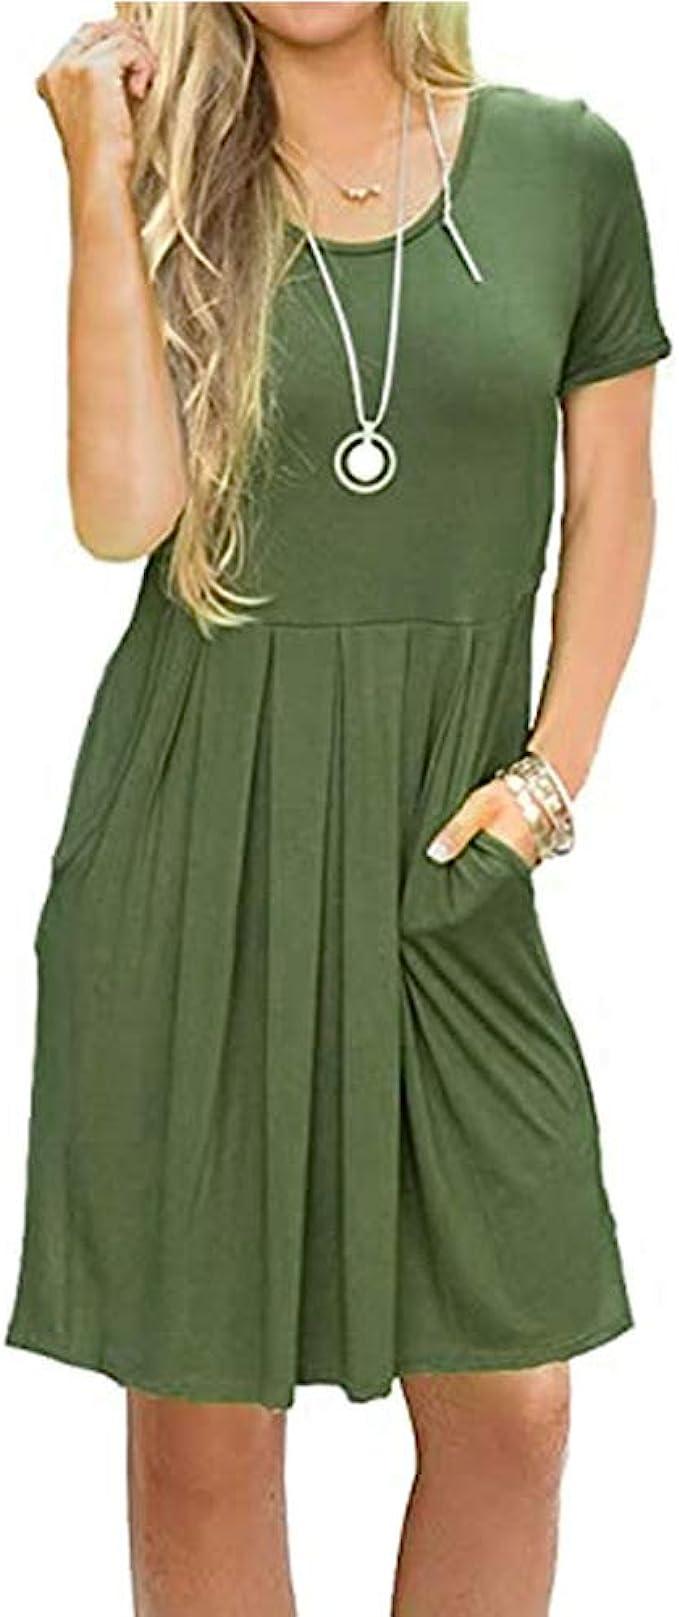 Newbestyle Sommerkleid Damen Tunika Tshirt Kleid Midikleid Kurzarm